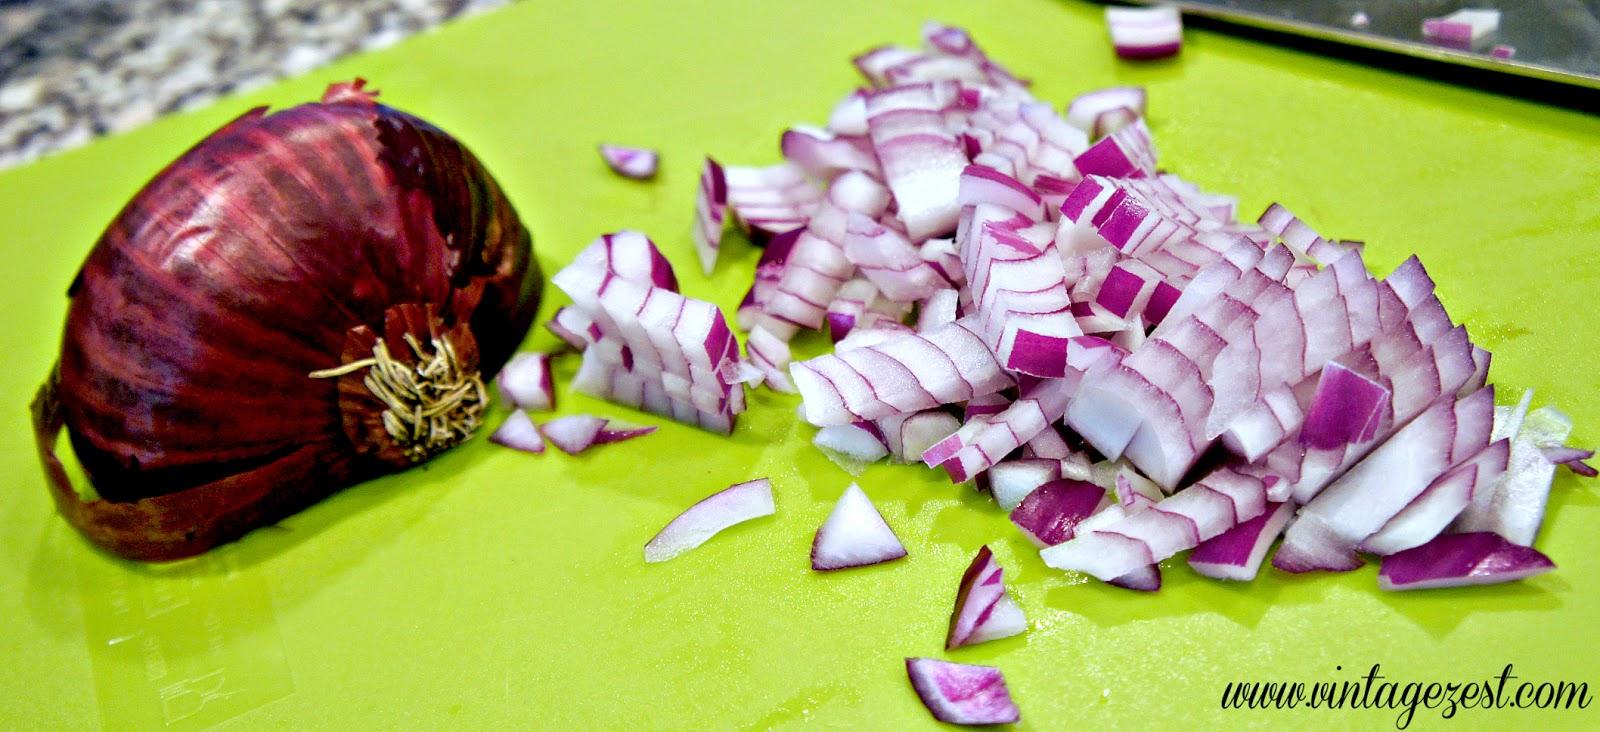 Grilled Tilapia with Spicy Mango Pineapple Salsa on Diane's Vintage Zest! #recipe #shop #cbias #GOWalmart #WMT5663